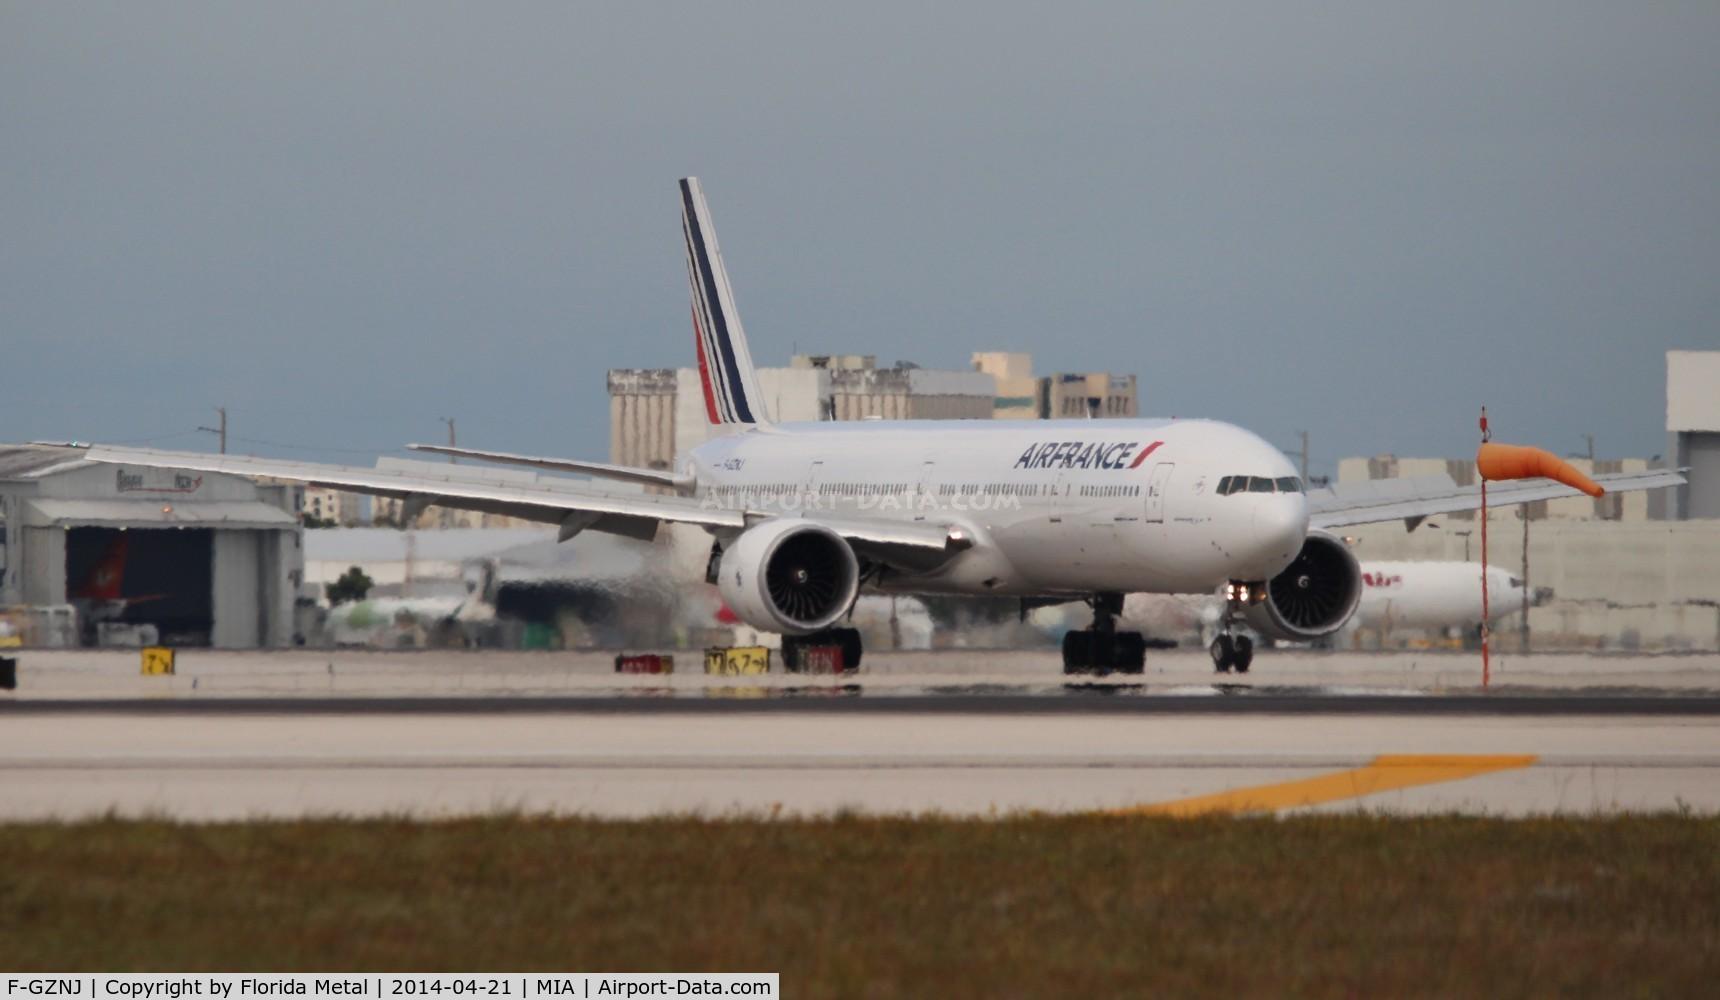 F-GZNJ, 2011 Boeing 777-328/ER C/N 38706, Air France 777-300